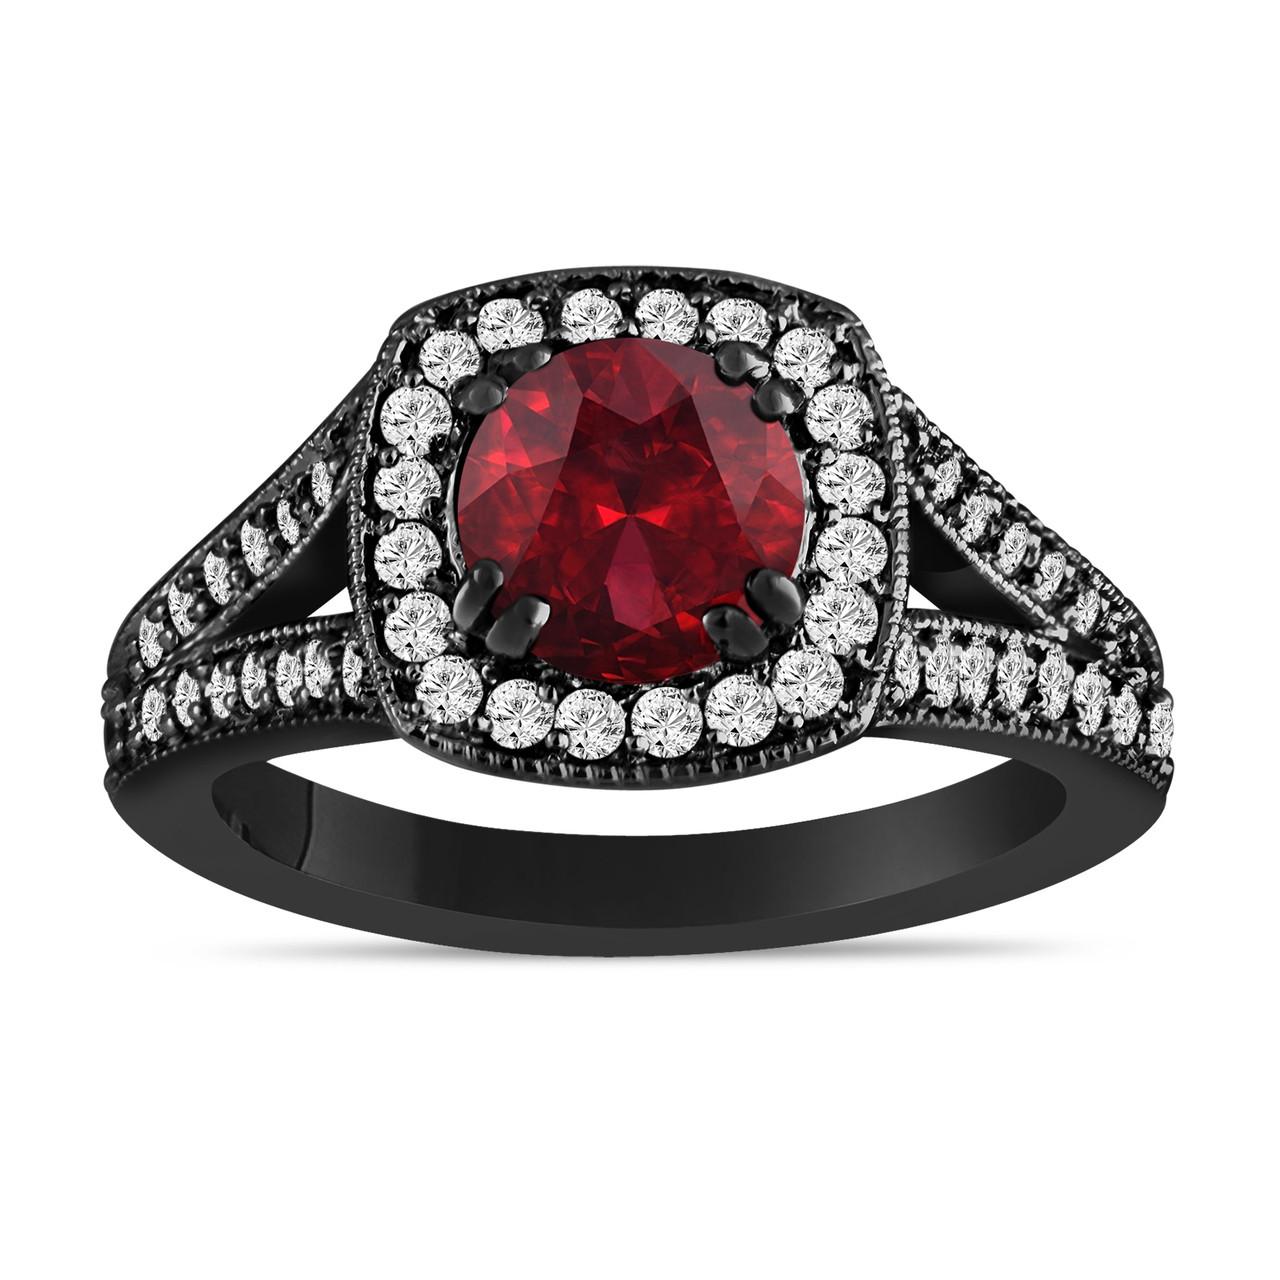 Red Garnet And Diamonds Engagement Ring 14k Black Gold